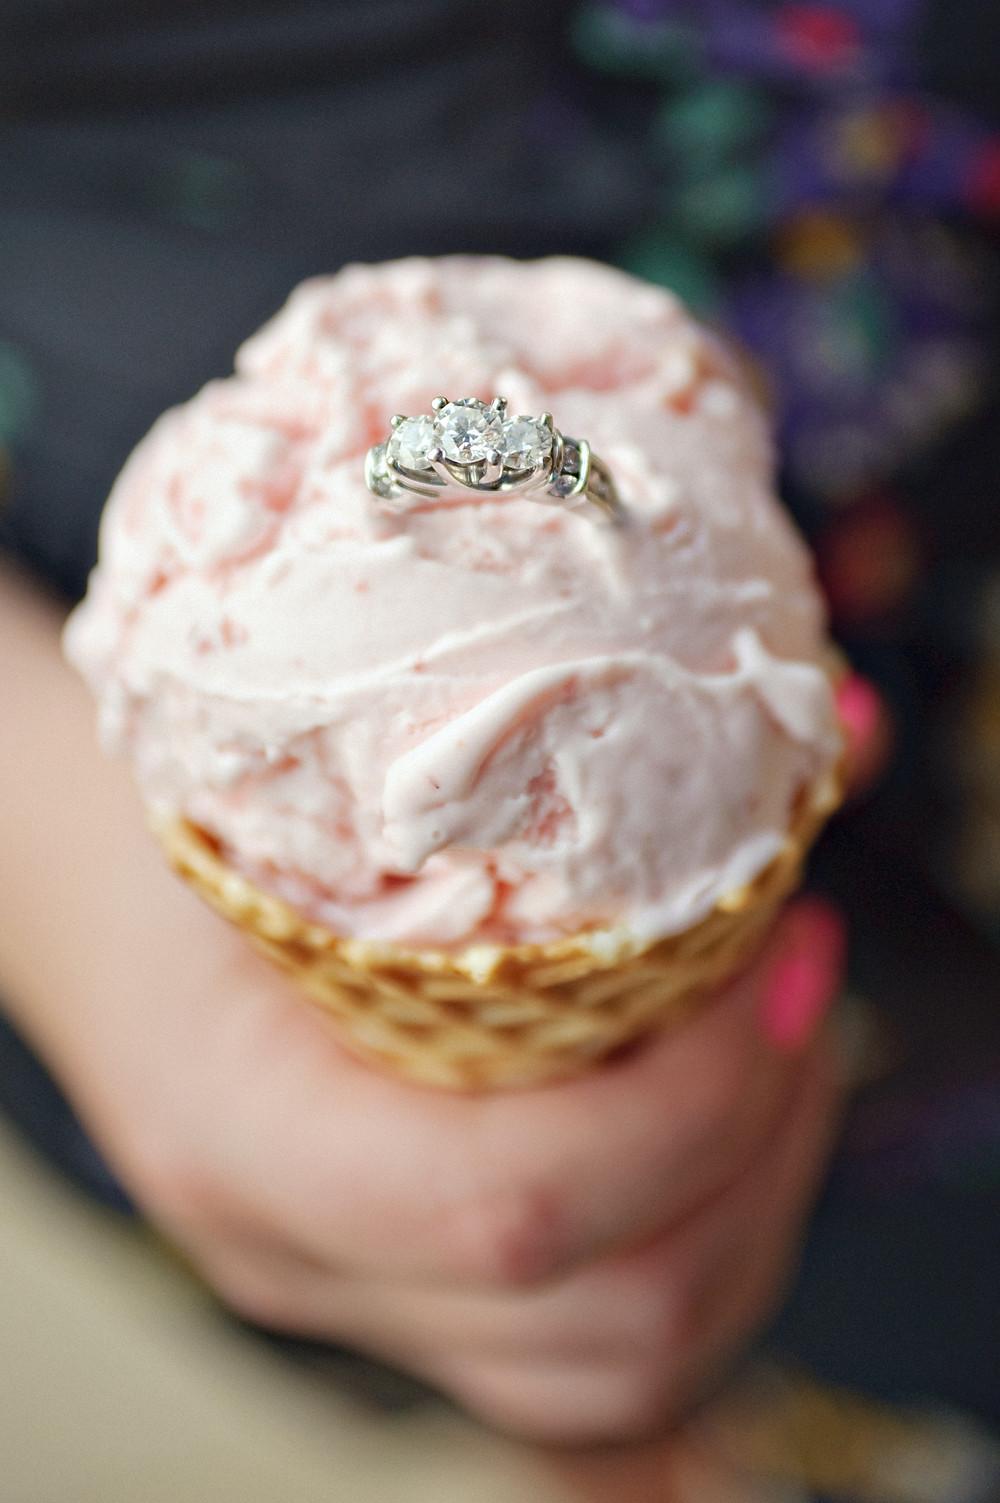 diamond-engagement-ring-inside-pink-icecream